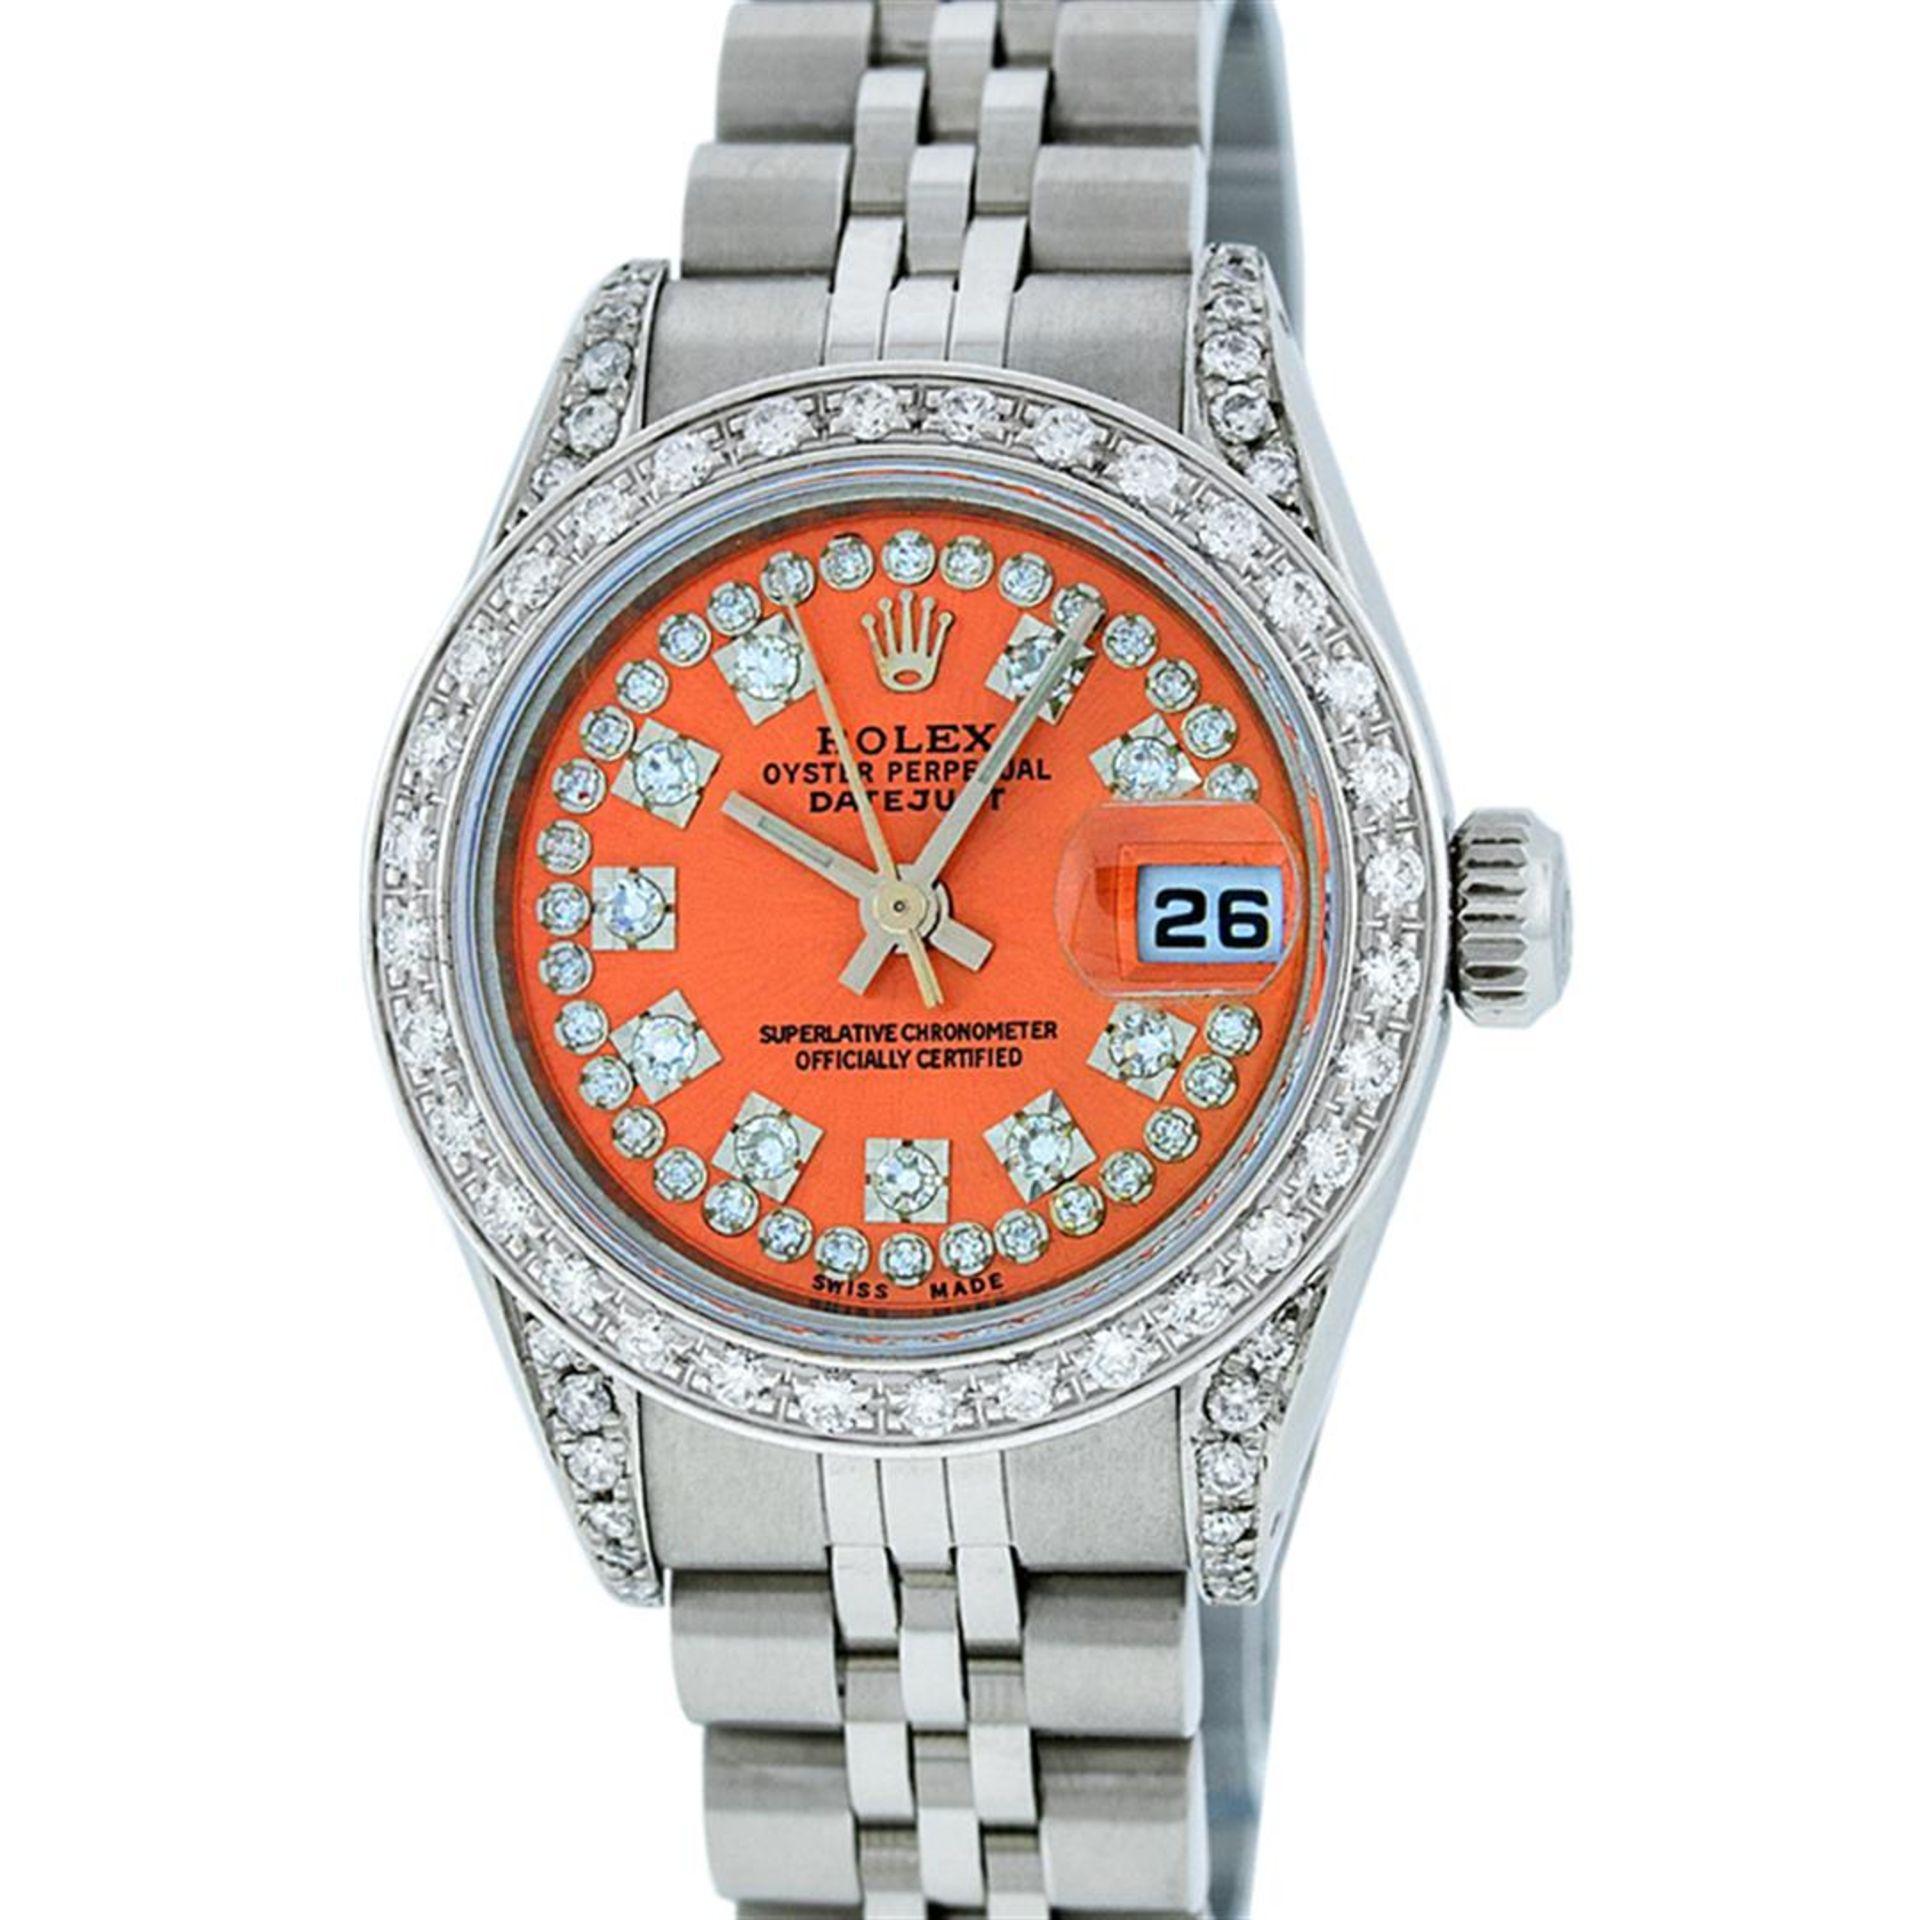 Rolex Ladies Stainless Steel 26MM Orange String Diamond Lugs Datejust Wristwatch - Image 2 of 9